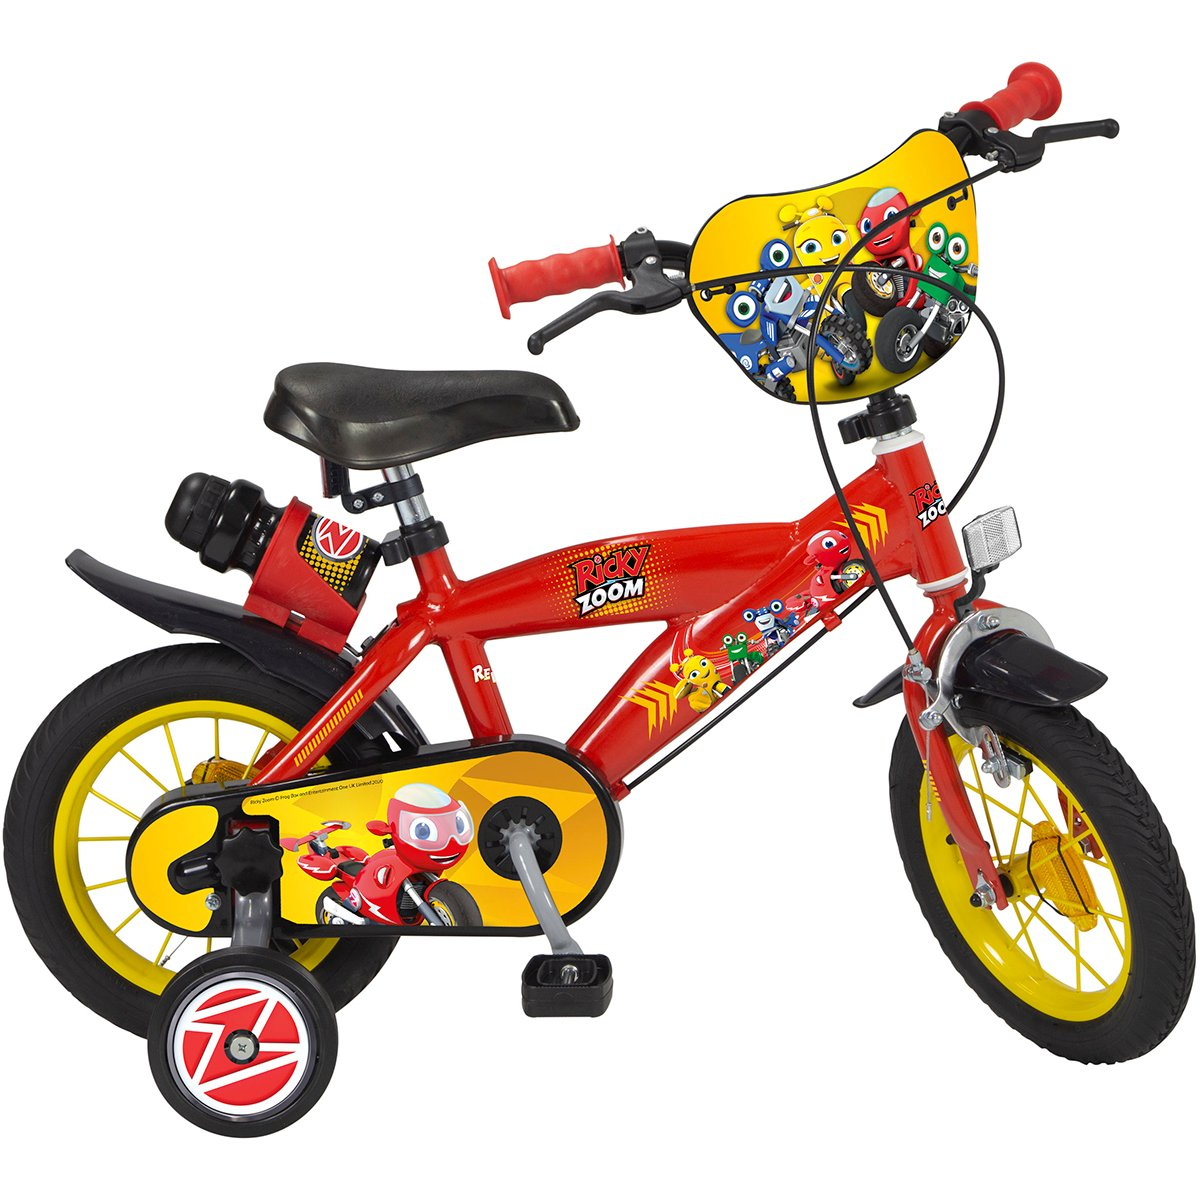 Bicicleta Ricky Zoom, 12 inch